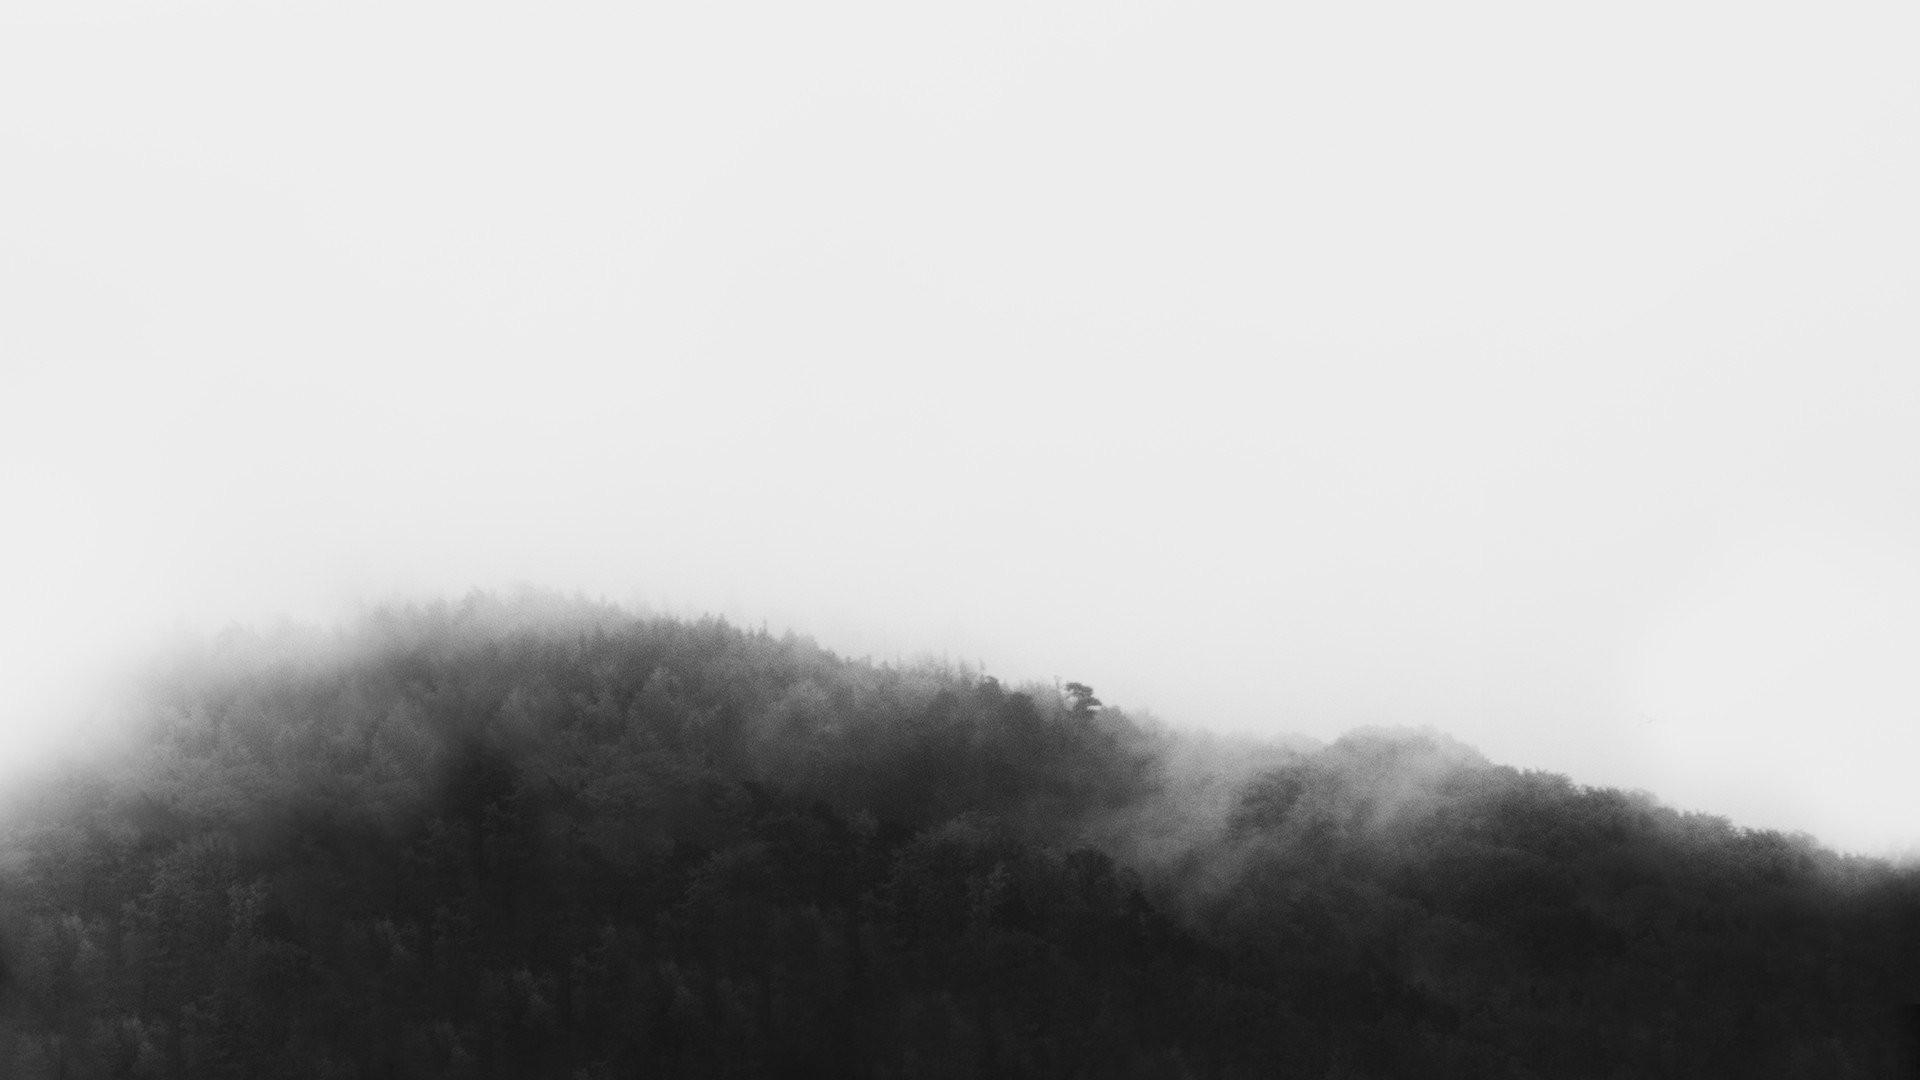 Black Background Tumblr Download Free Wallpapers For: 57+ Aesthetic Tumblr Backgrounds Black ·① Download Free